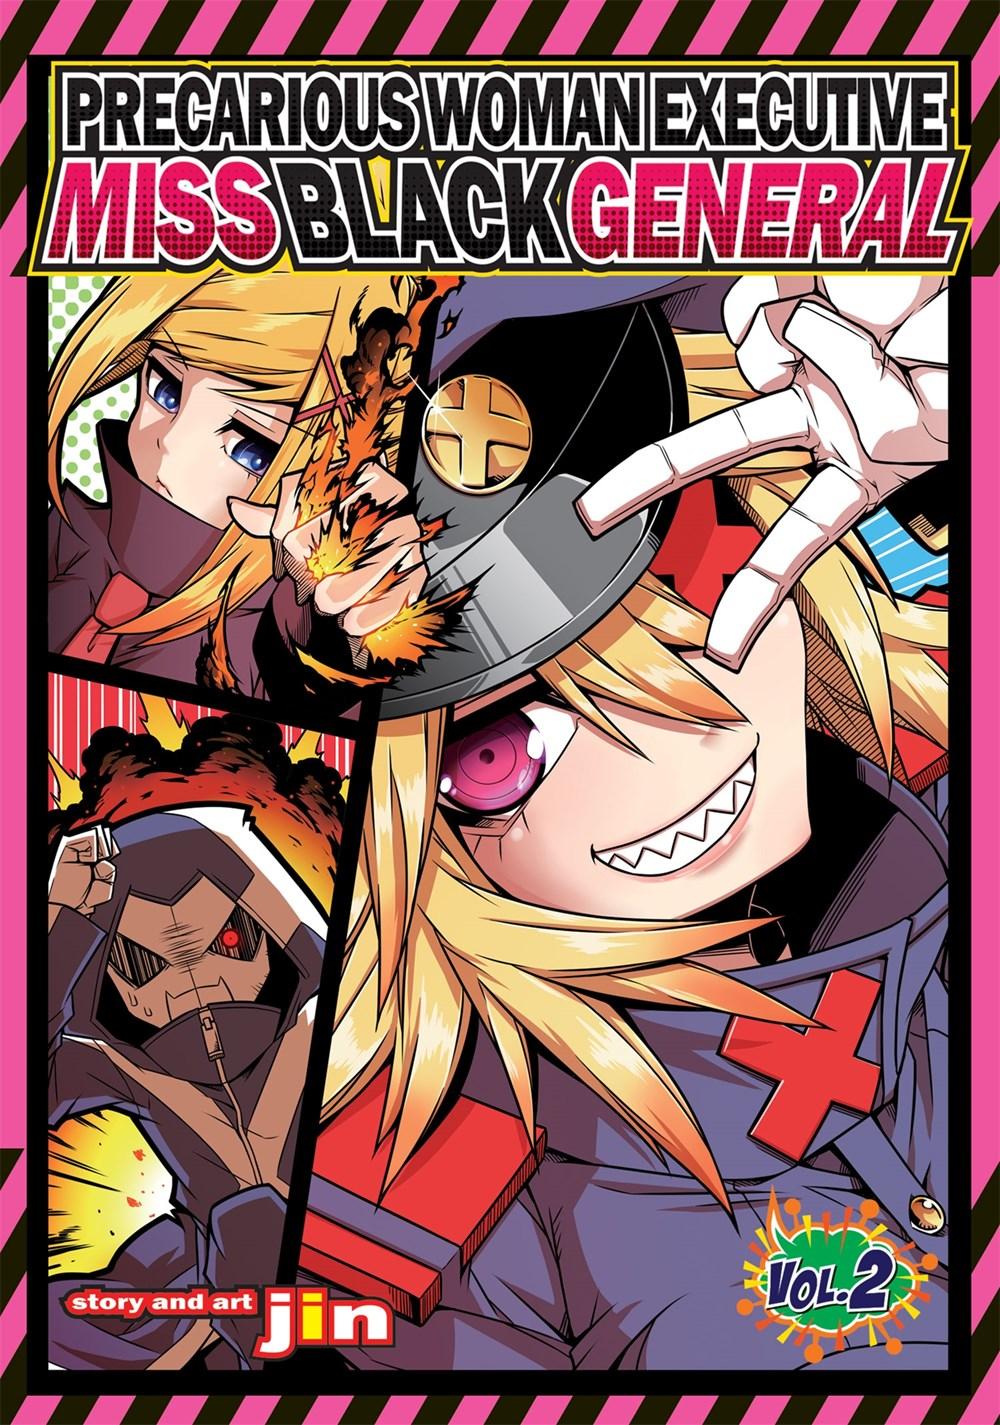 Precarious Woman Executive Miss Black General Manga Volume 2